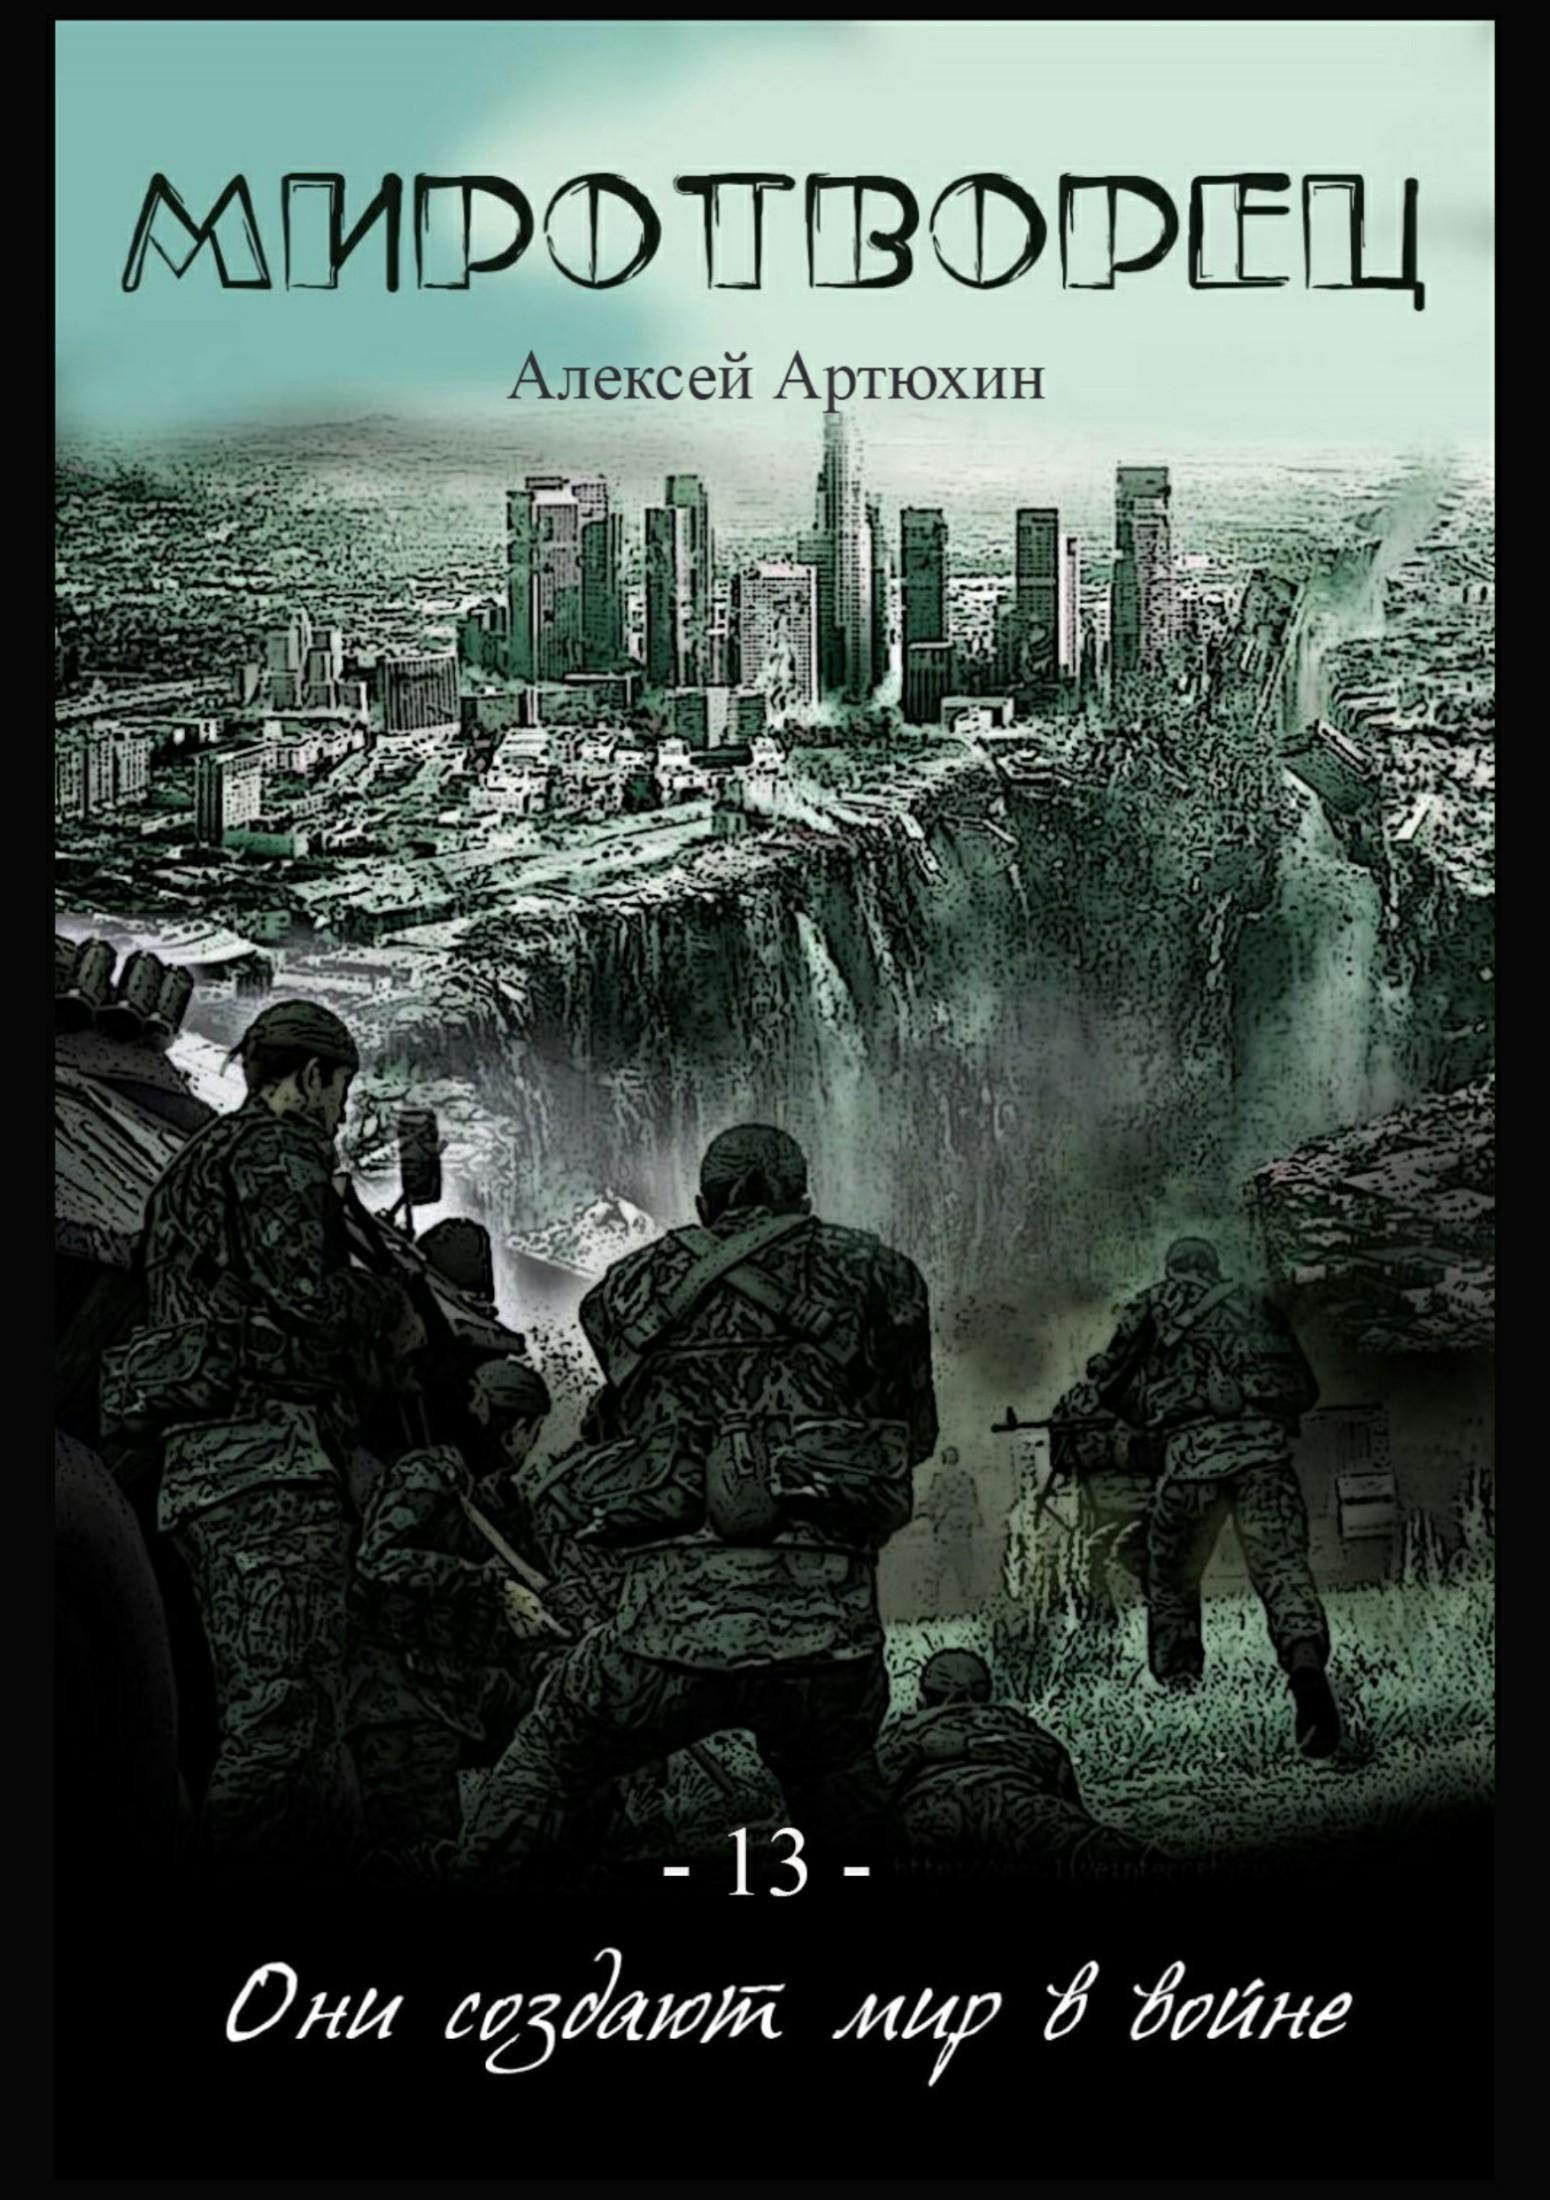 Алексей Артюхин. Миротворец